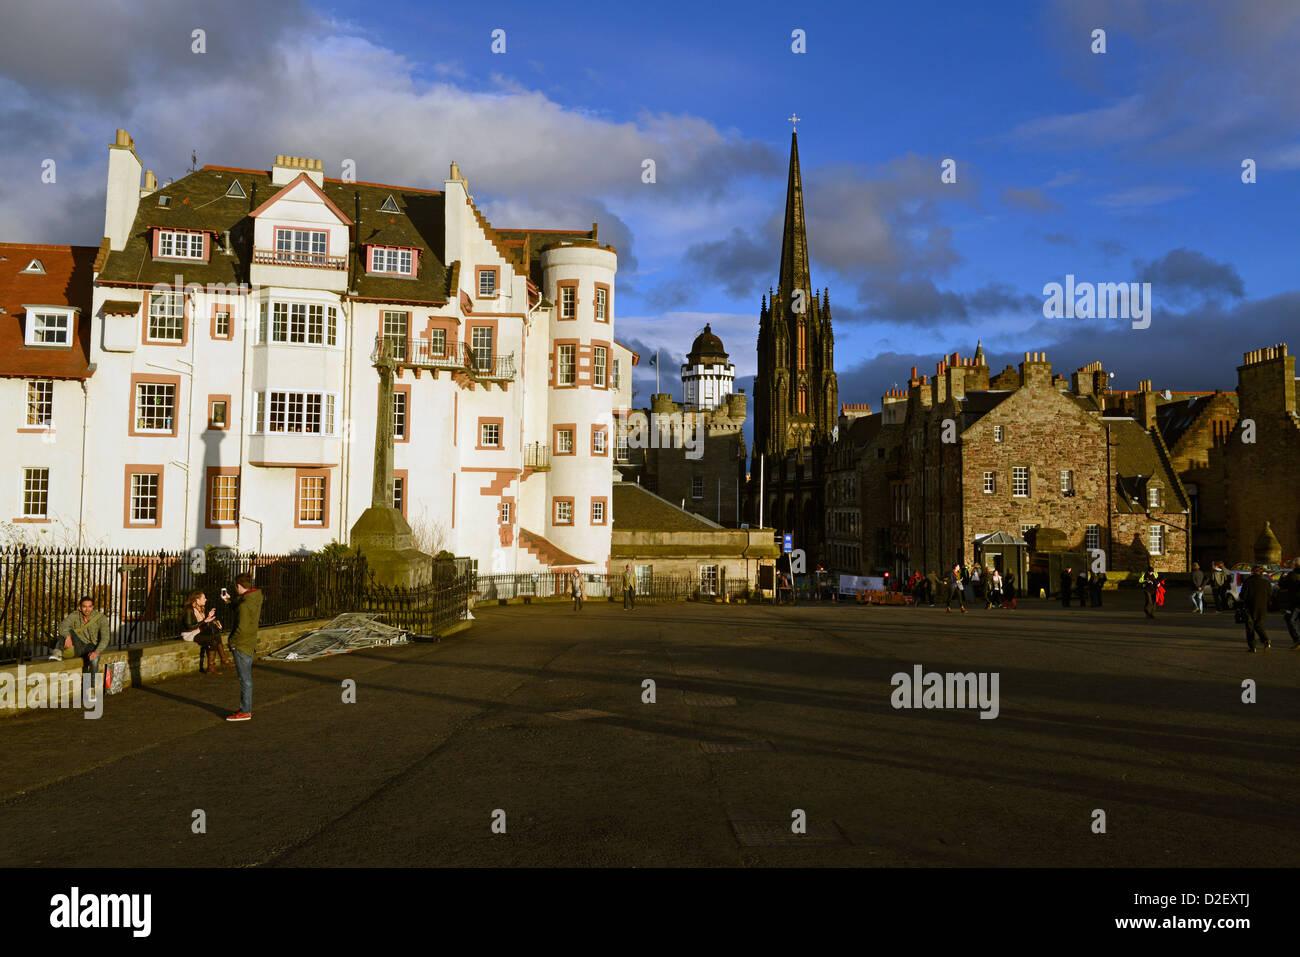 View of beginning of Royal Mile in Edinburh, from Edinburgh Castle. - Stock Image